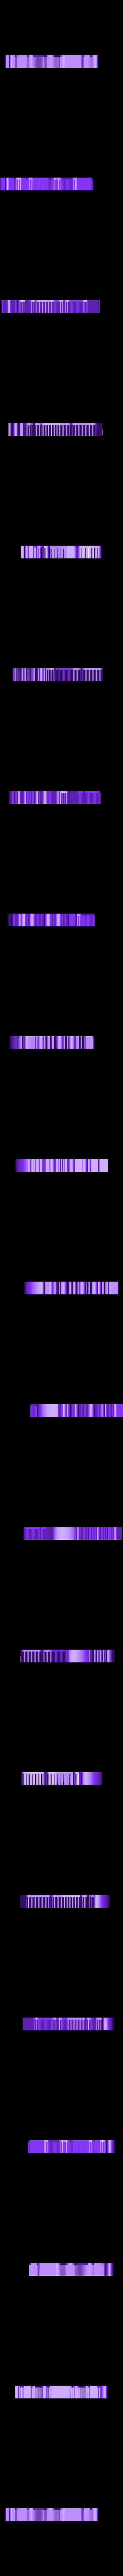 C6aaf210 24d7 47f6 9733 c1b33ef2c705